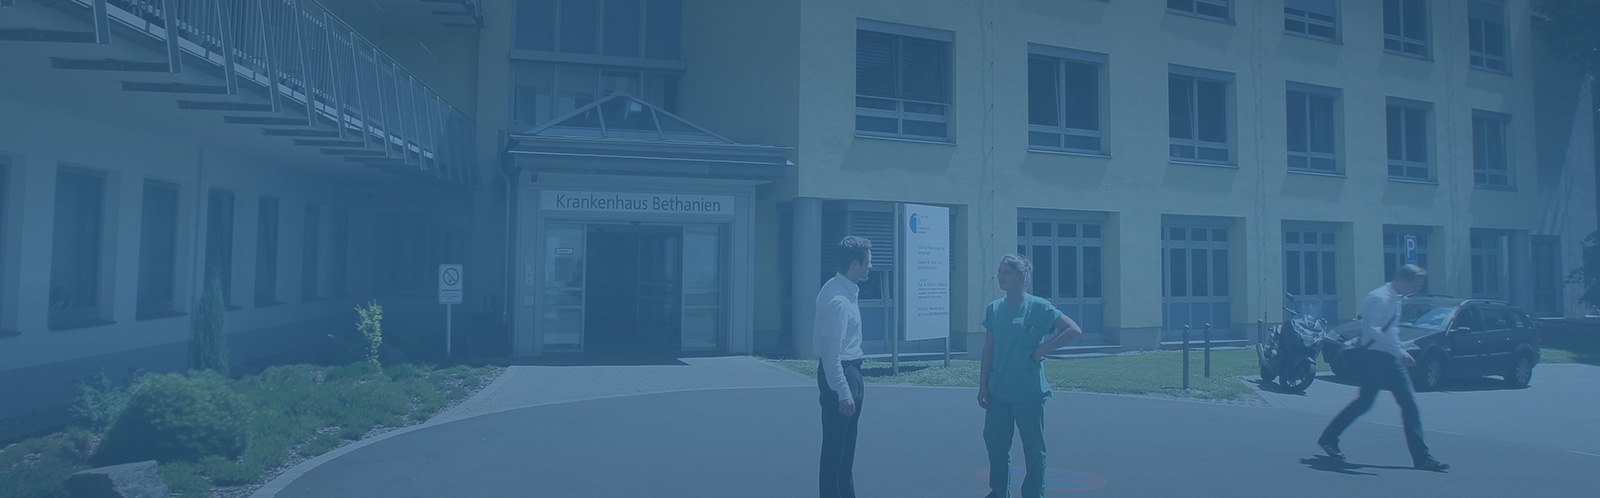 Solingen Krankenhaus Bethanien